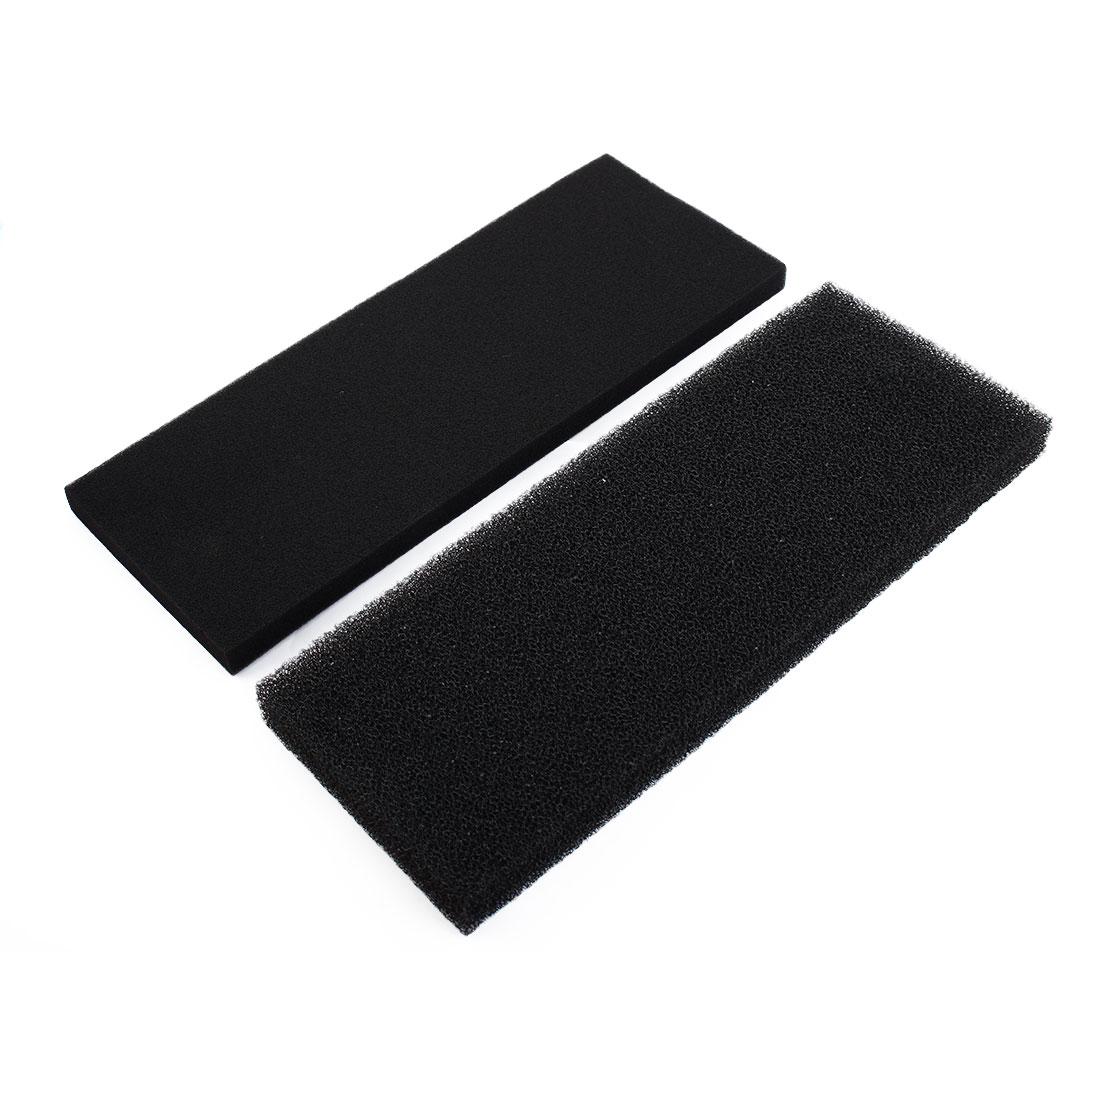 2 Pcs Rectangular Biochemical Filter Cotton Bio Sponge Pad Black for Fish Tank